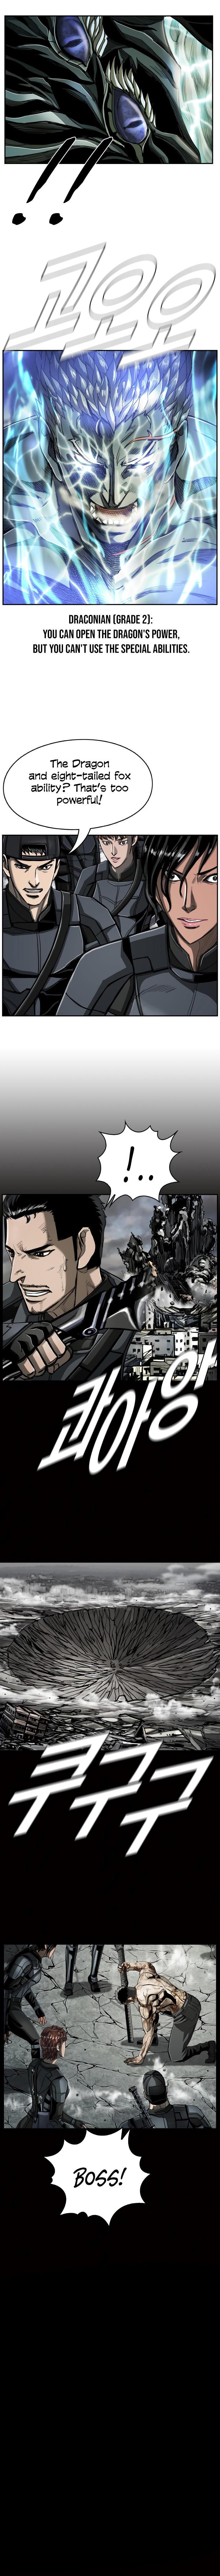 The First Hunter Chapter 72 page 5 - Mangakakalots.com